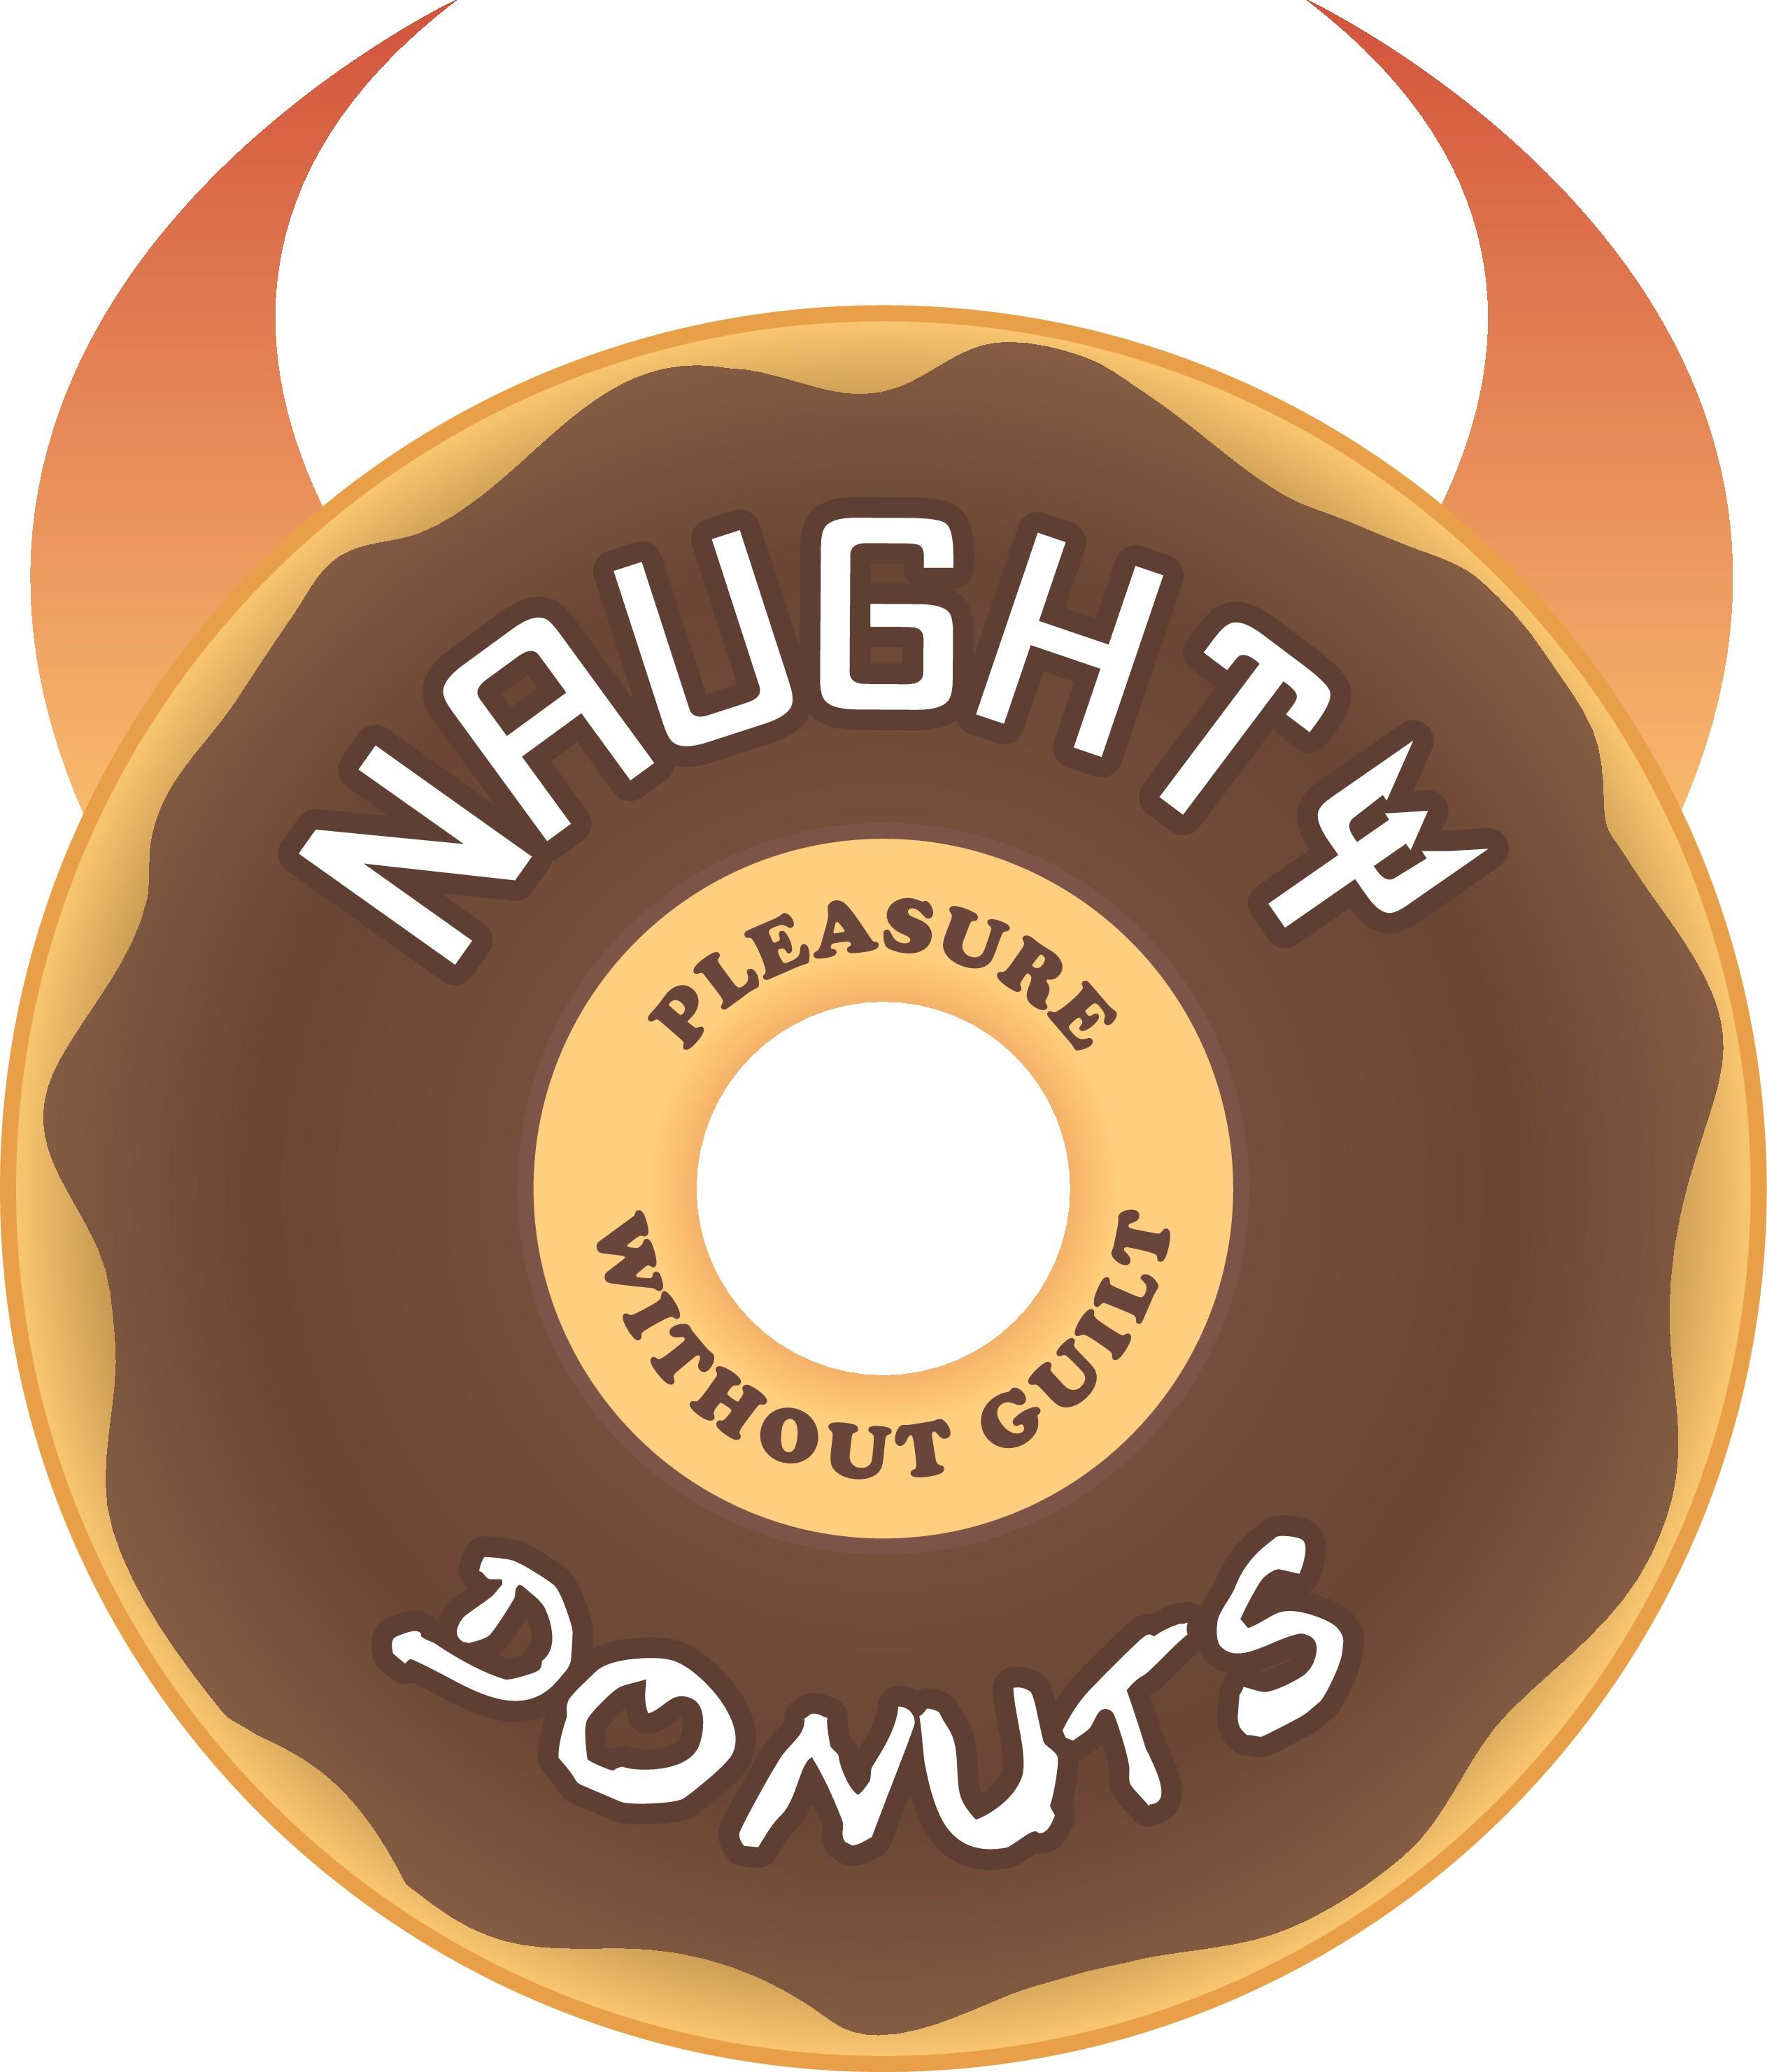 Naughty Donuts v2